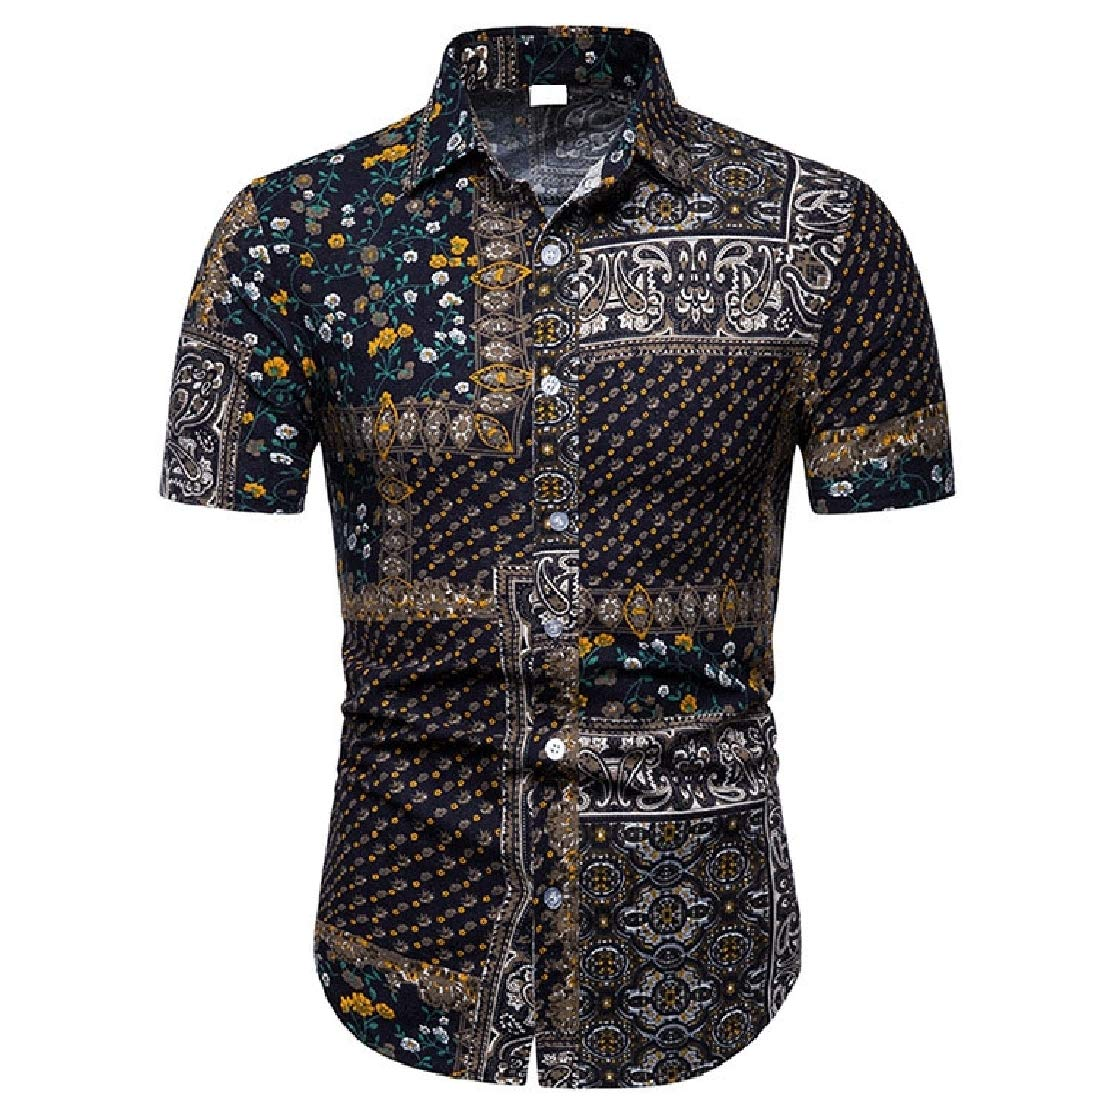 Colourful Mens Beachwear Digital Print Summer Linen Short-Sleeve Hawaii Casual Shirt